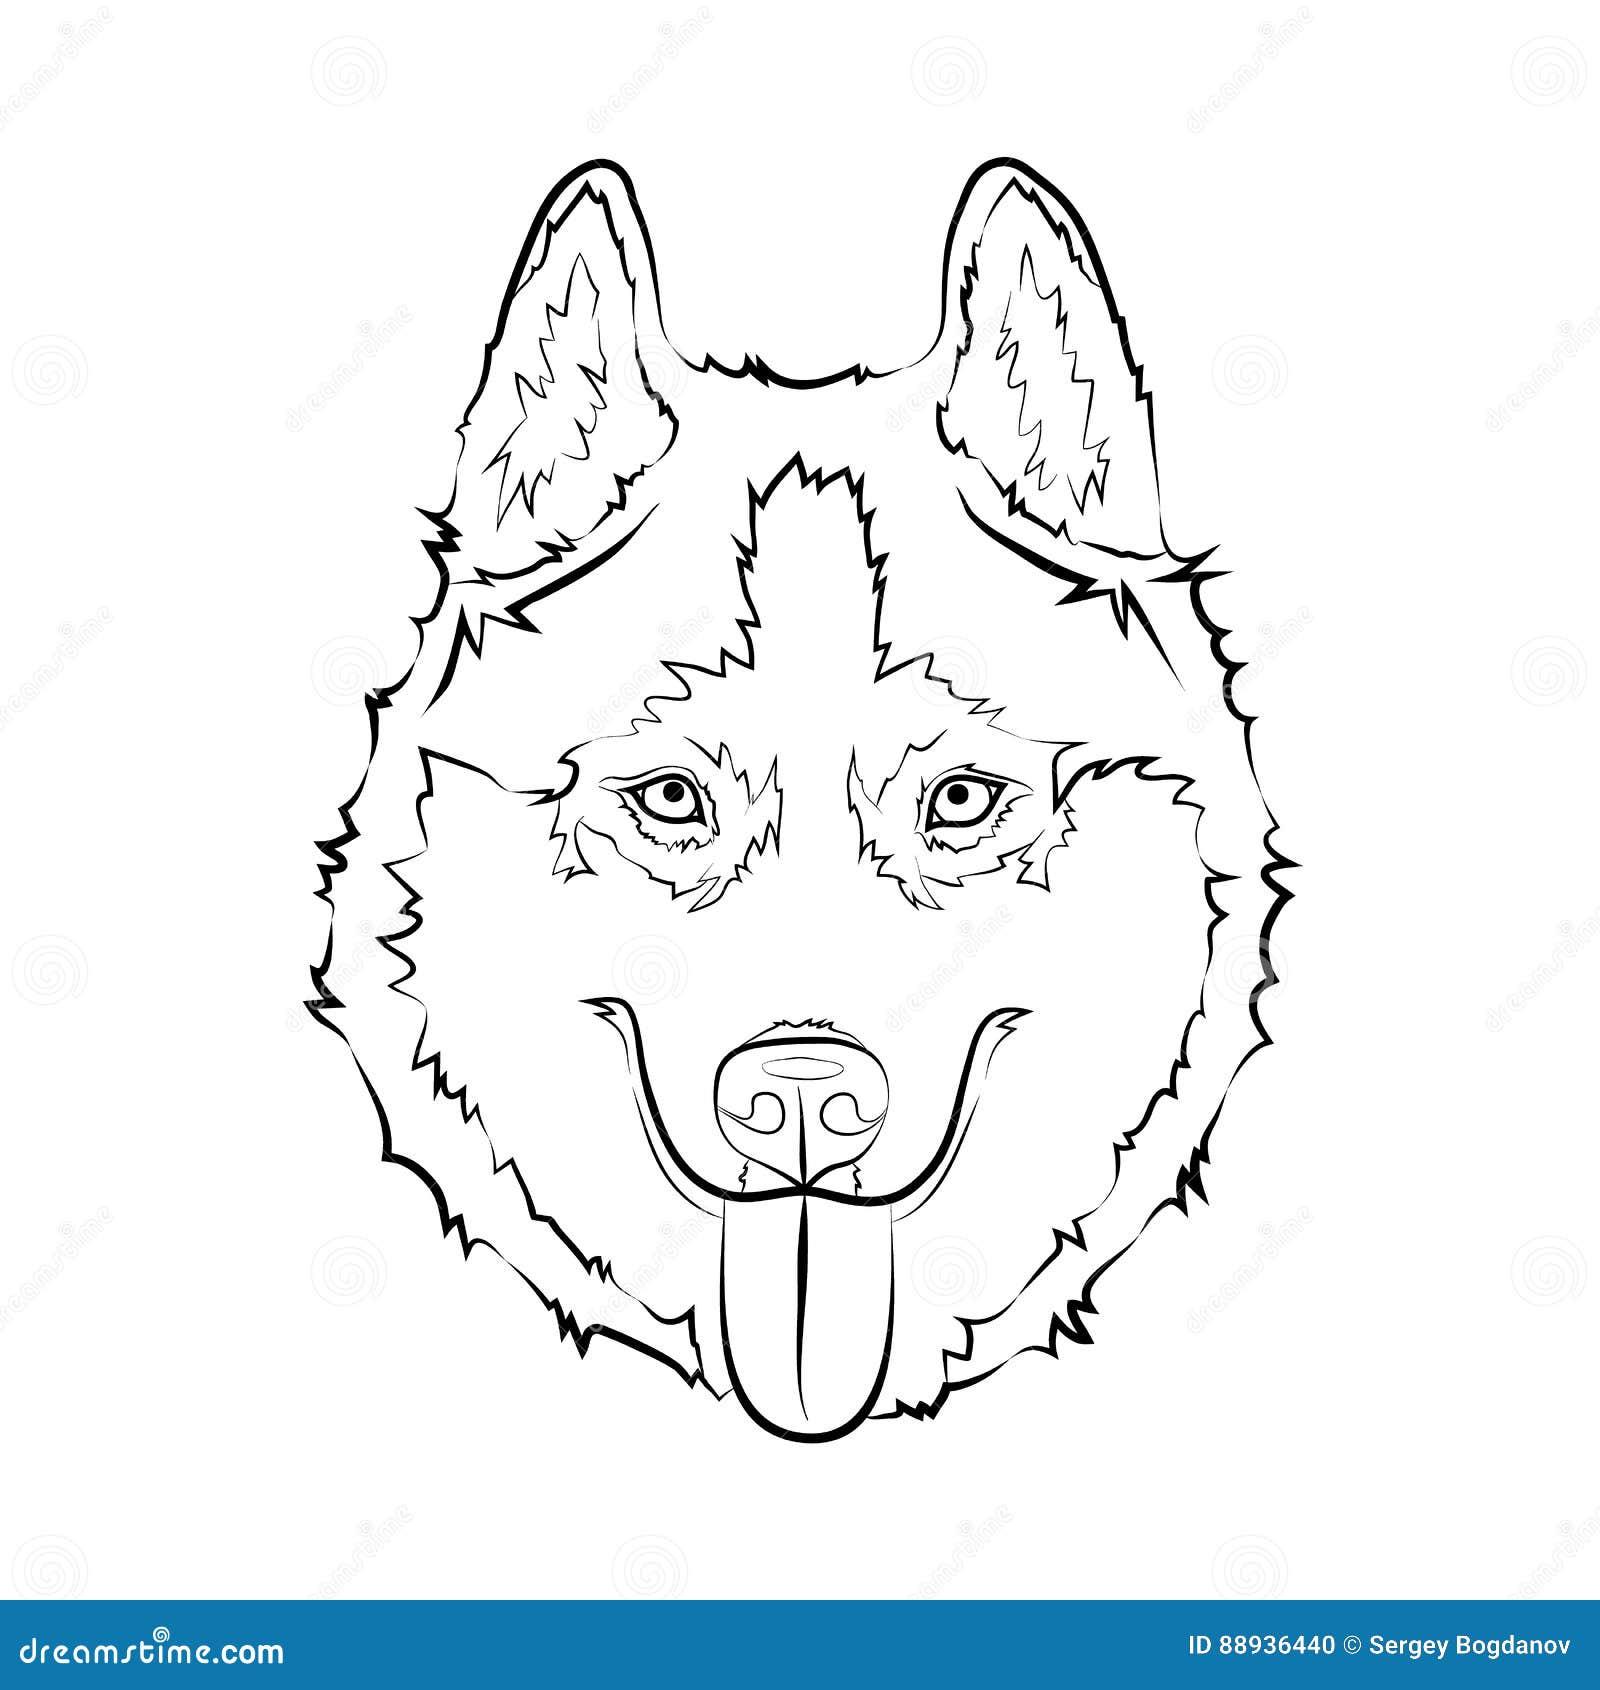 Husky Dog Sketch Stock Vector Illustration Of Black 88936440